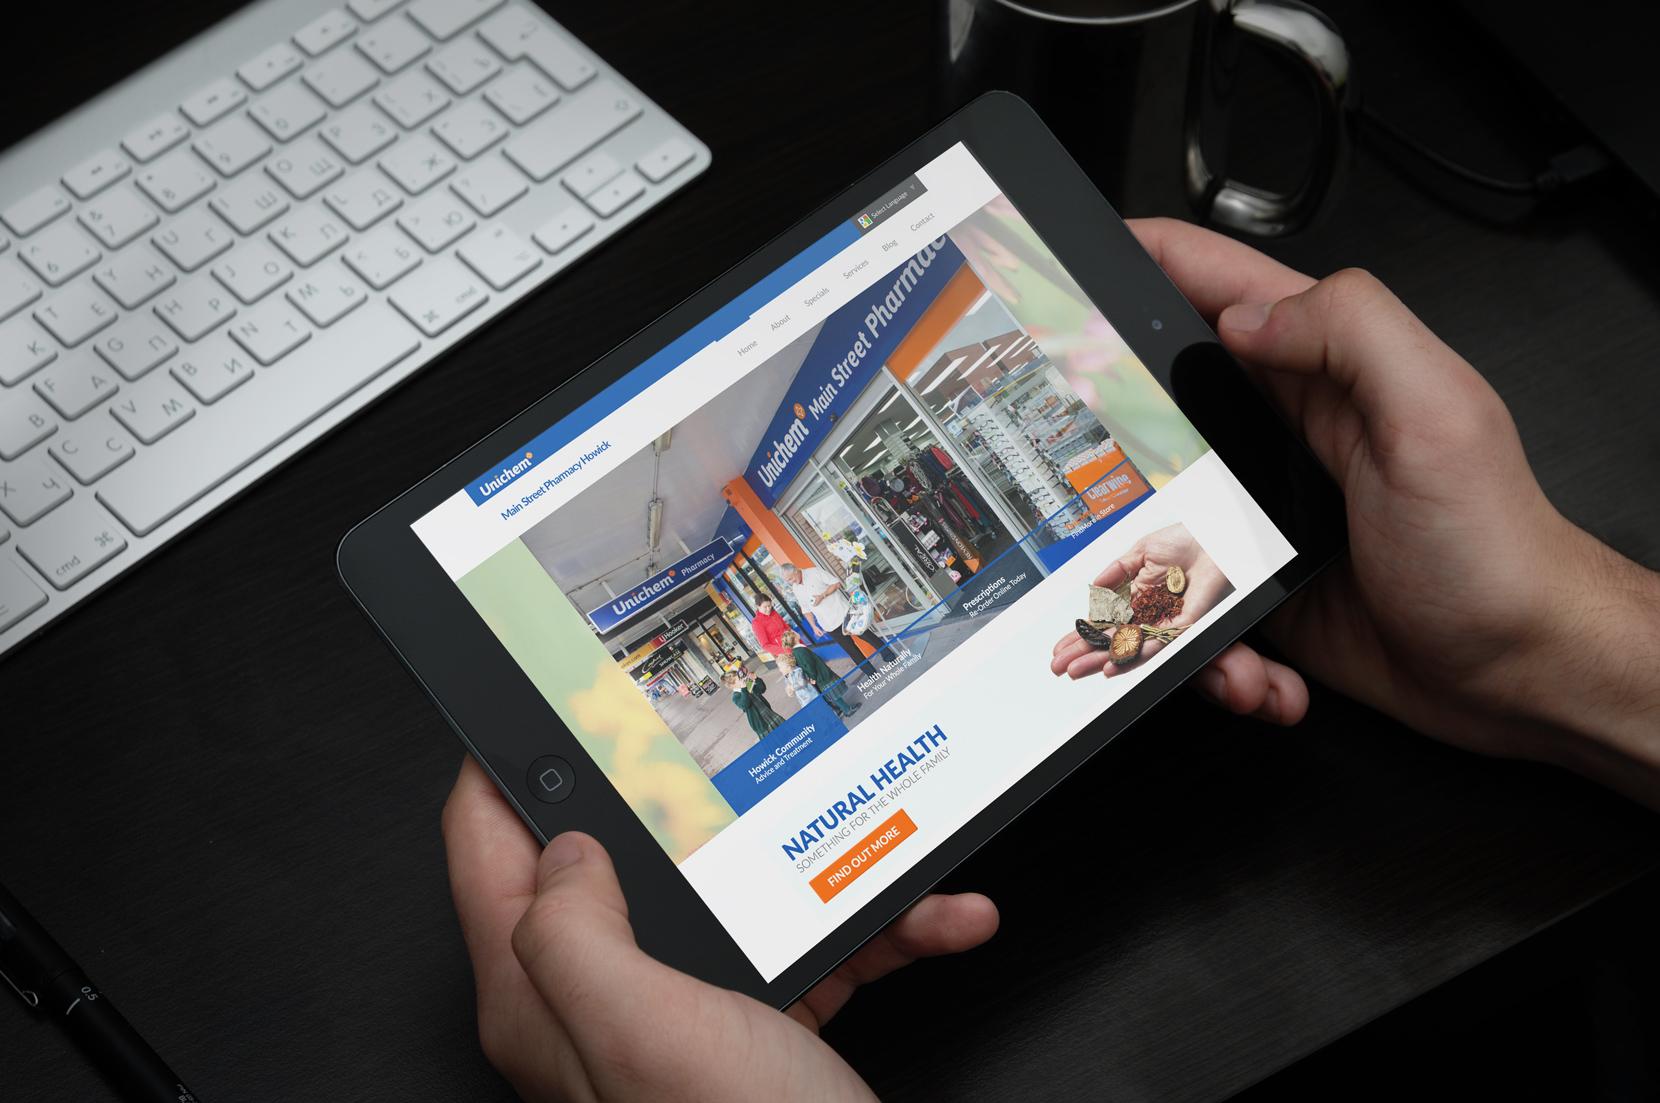 HowickPharmacy-iPad-in-hands.jpg